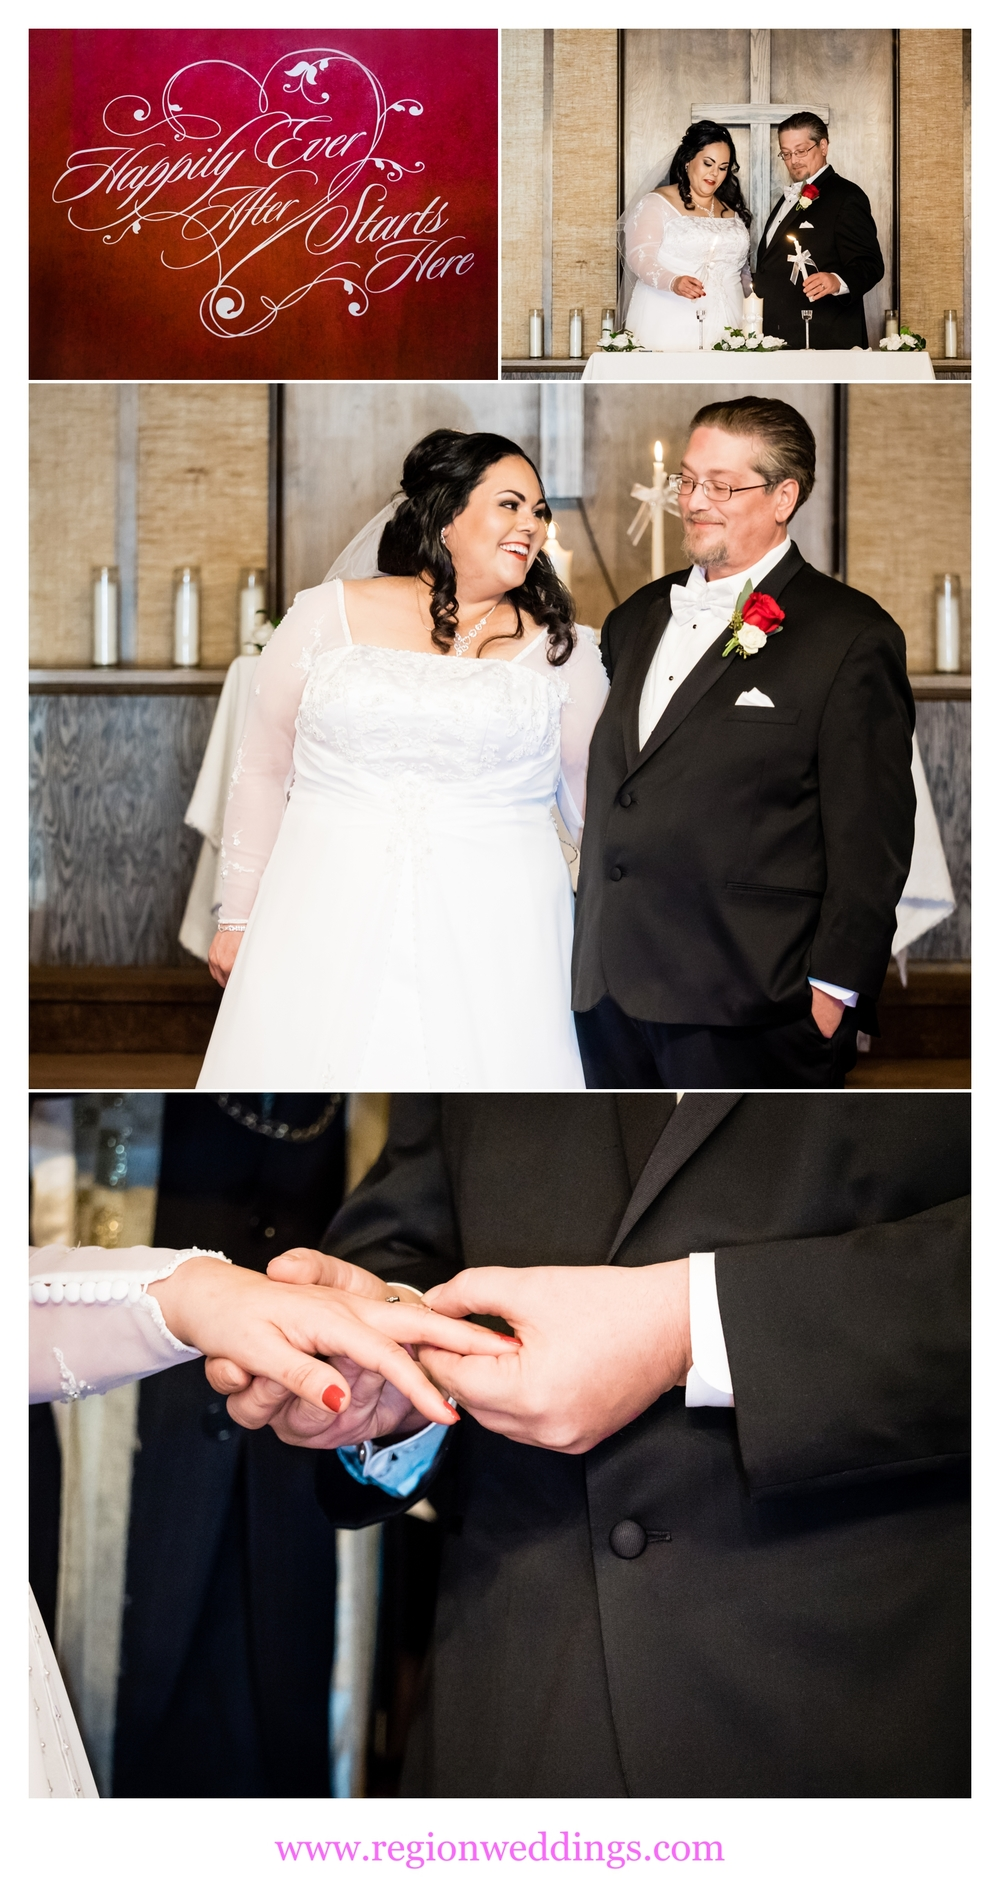 Wedding ceremony at Free Spirit Church.